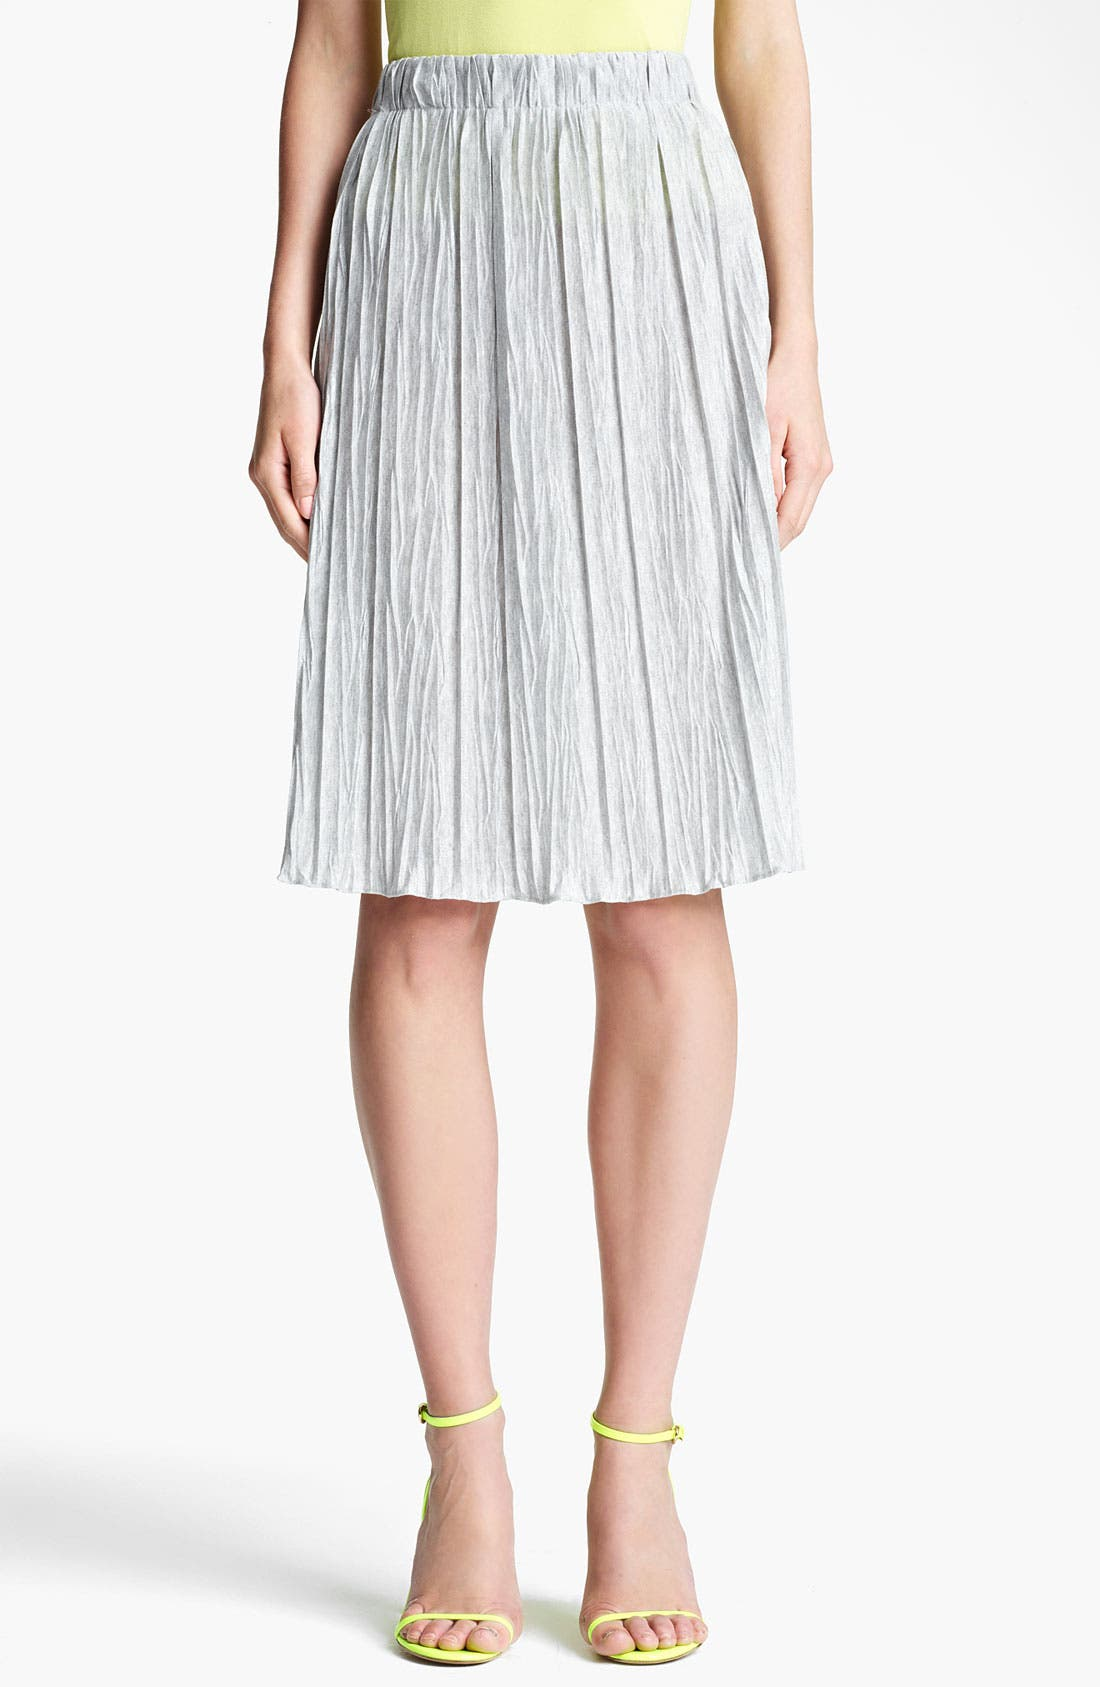 Alternate Image 1 Selected - Lida Baday Plissé Stretch Jersey Skirt